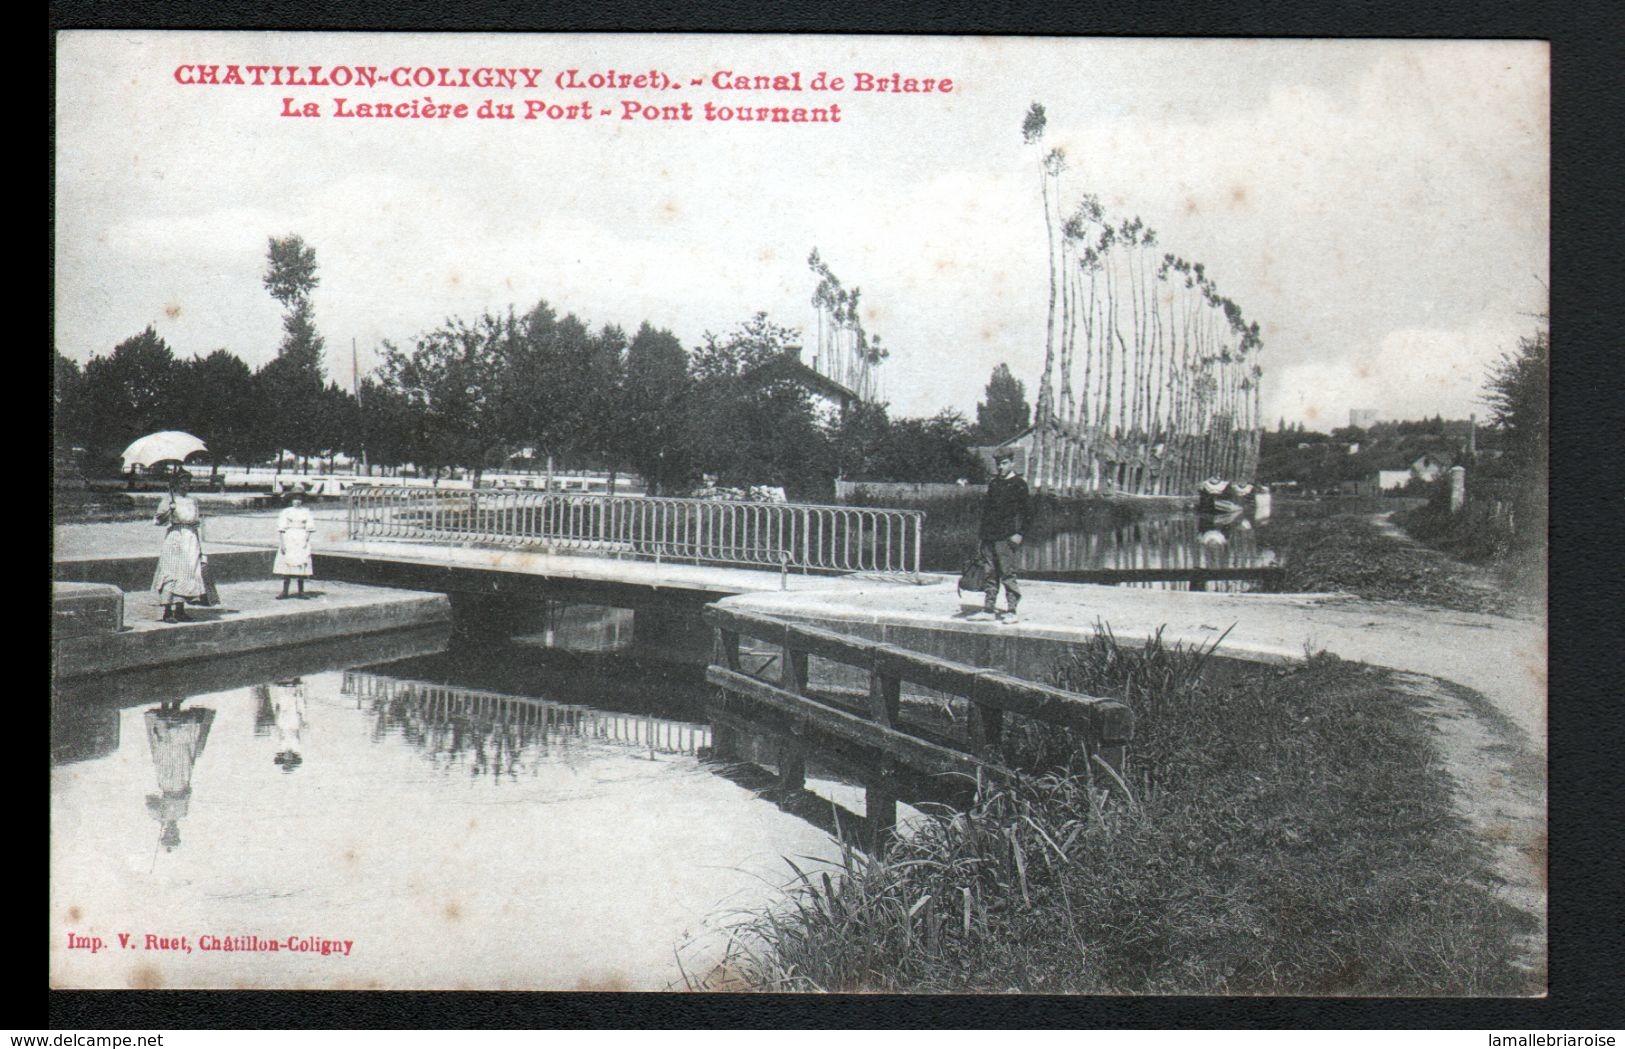 45, Chatillon Coloigny, Canal De Briare, La Lanciere Du Port, Pont Tournant - Chatillon Coligny